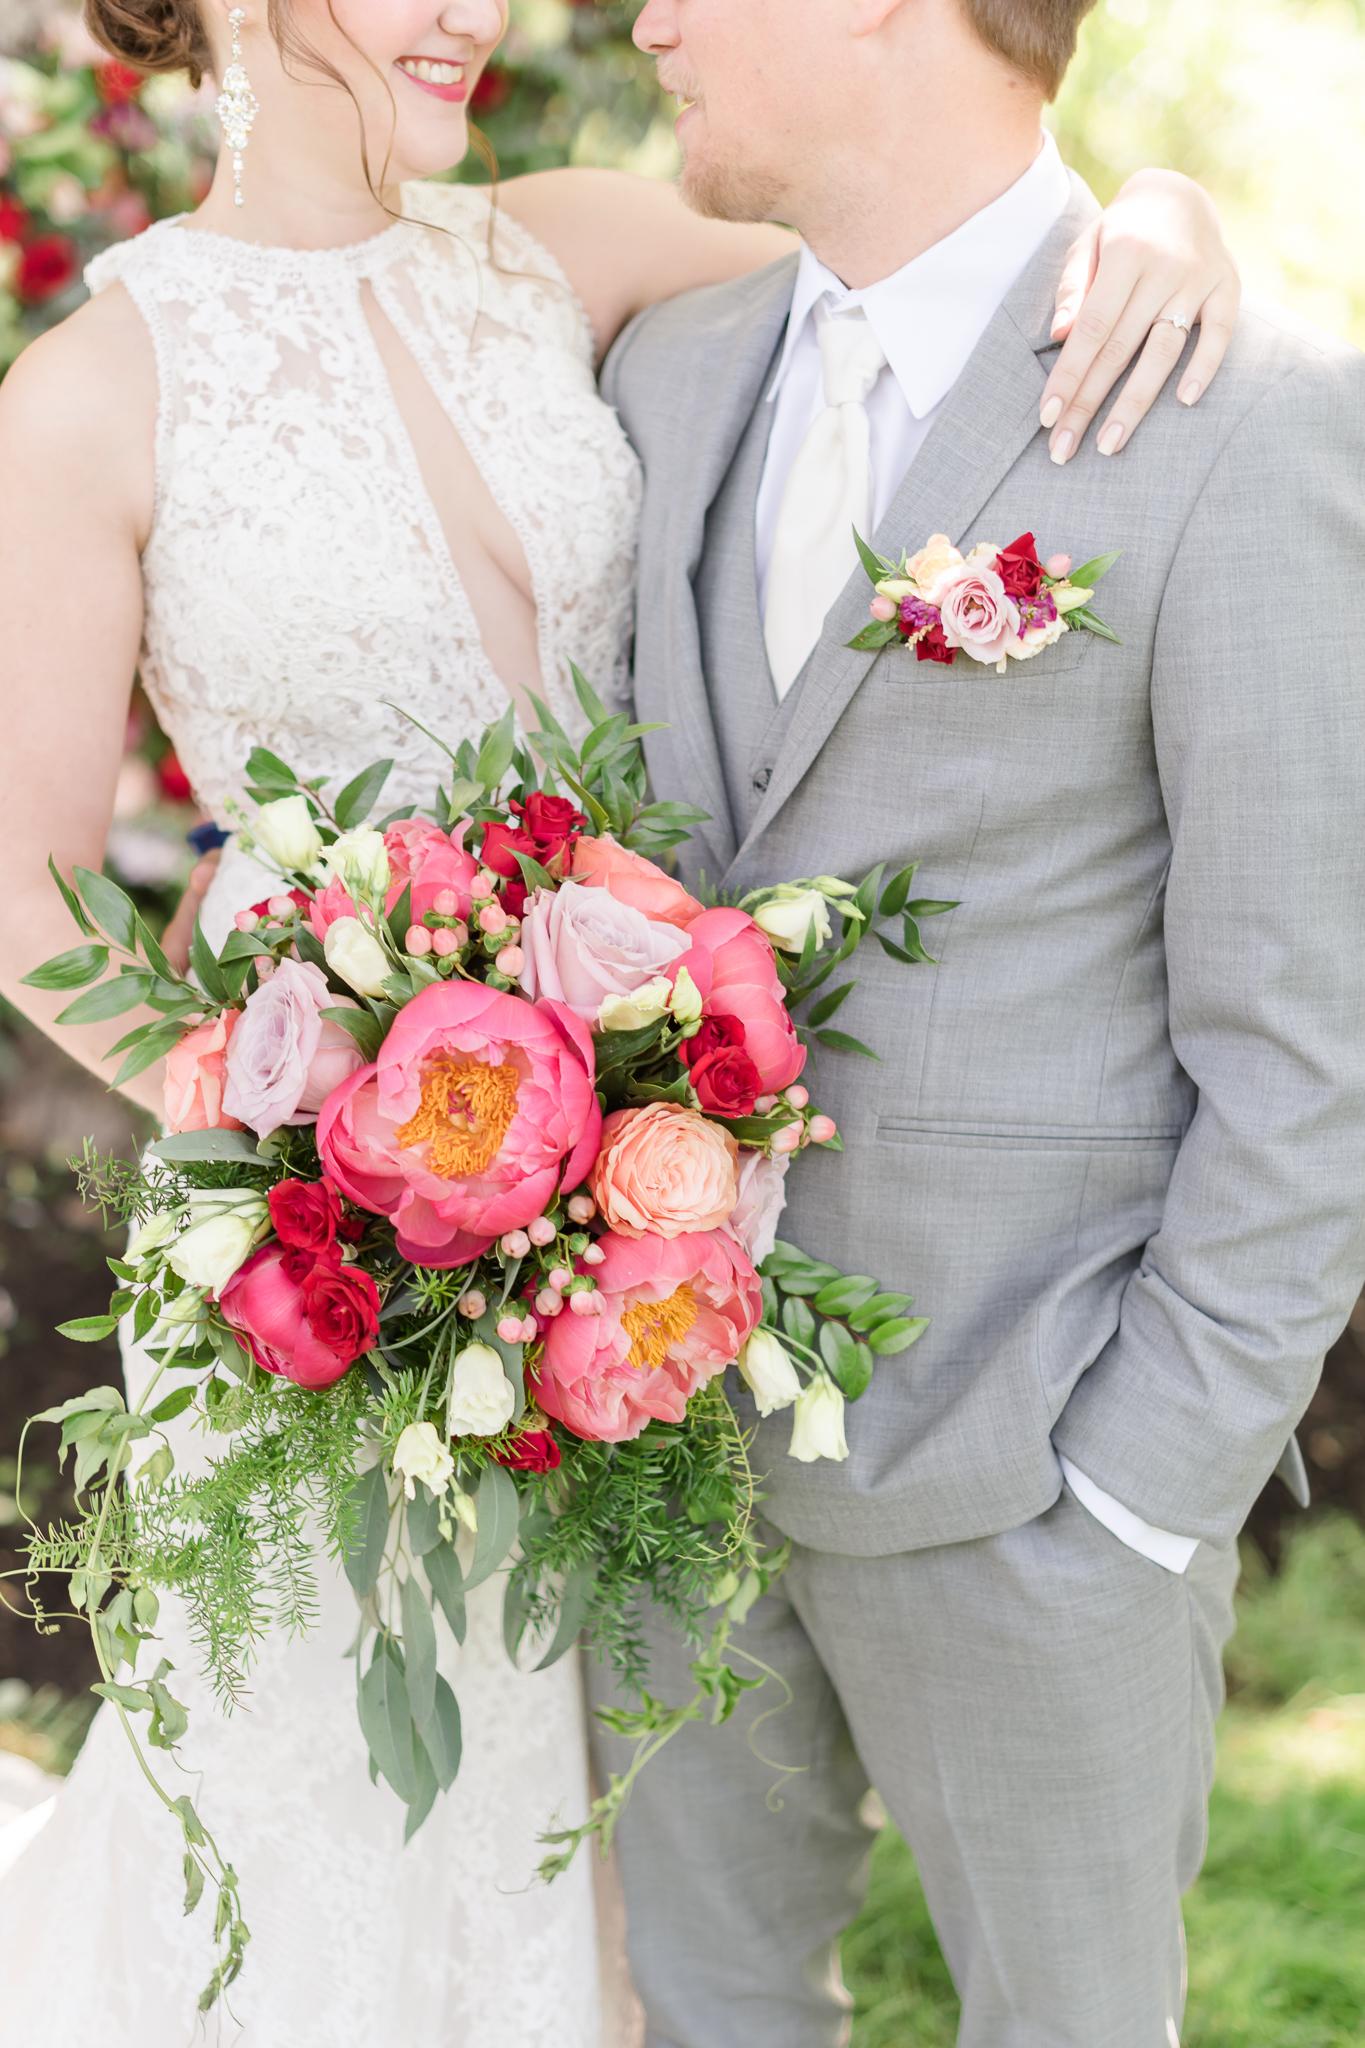 Mustard Seed Gardens Wedding Indianapolis Noblesvile Fishers Wedding Photographer-27.jpg